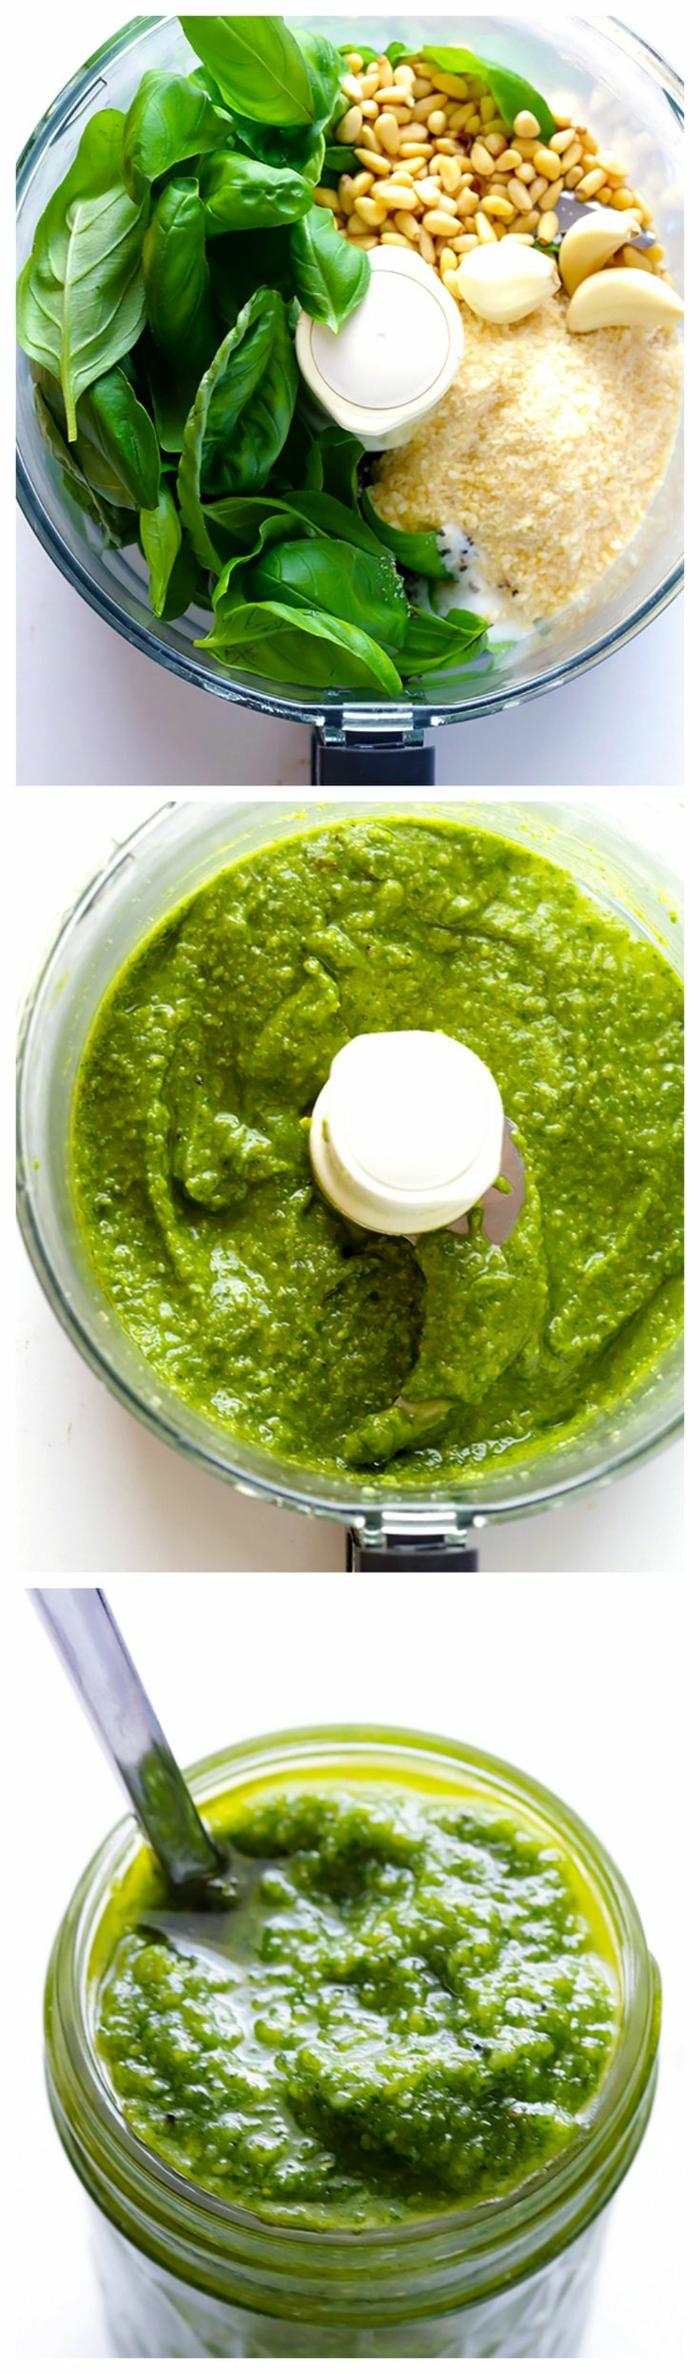 einfache kochrezepte gesunde ernährung guacamole rezepte